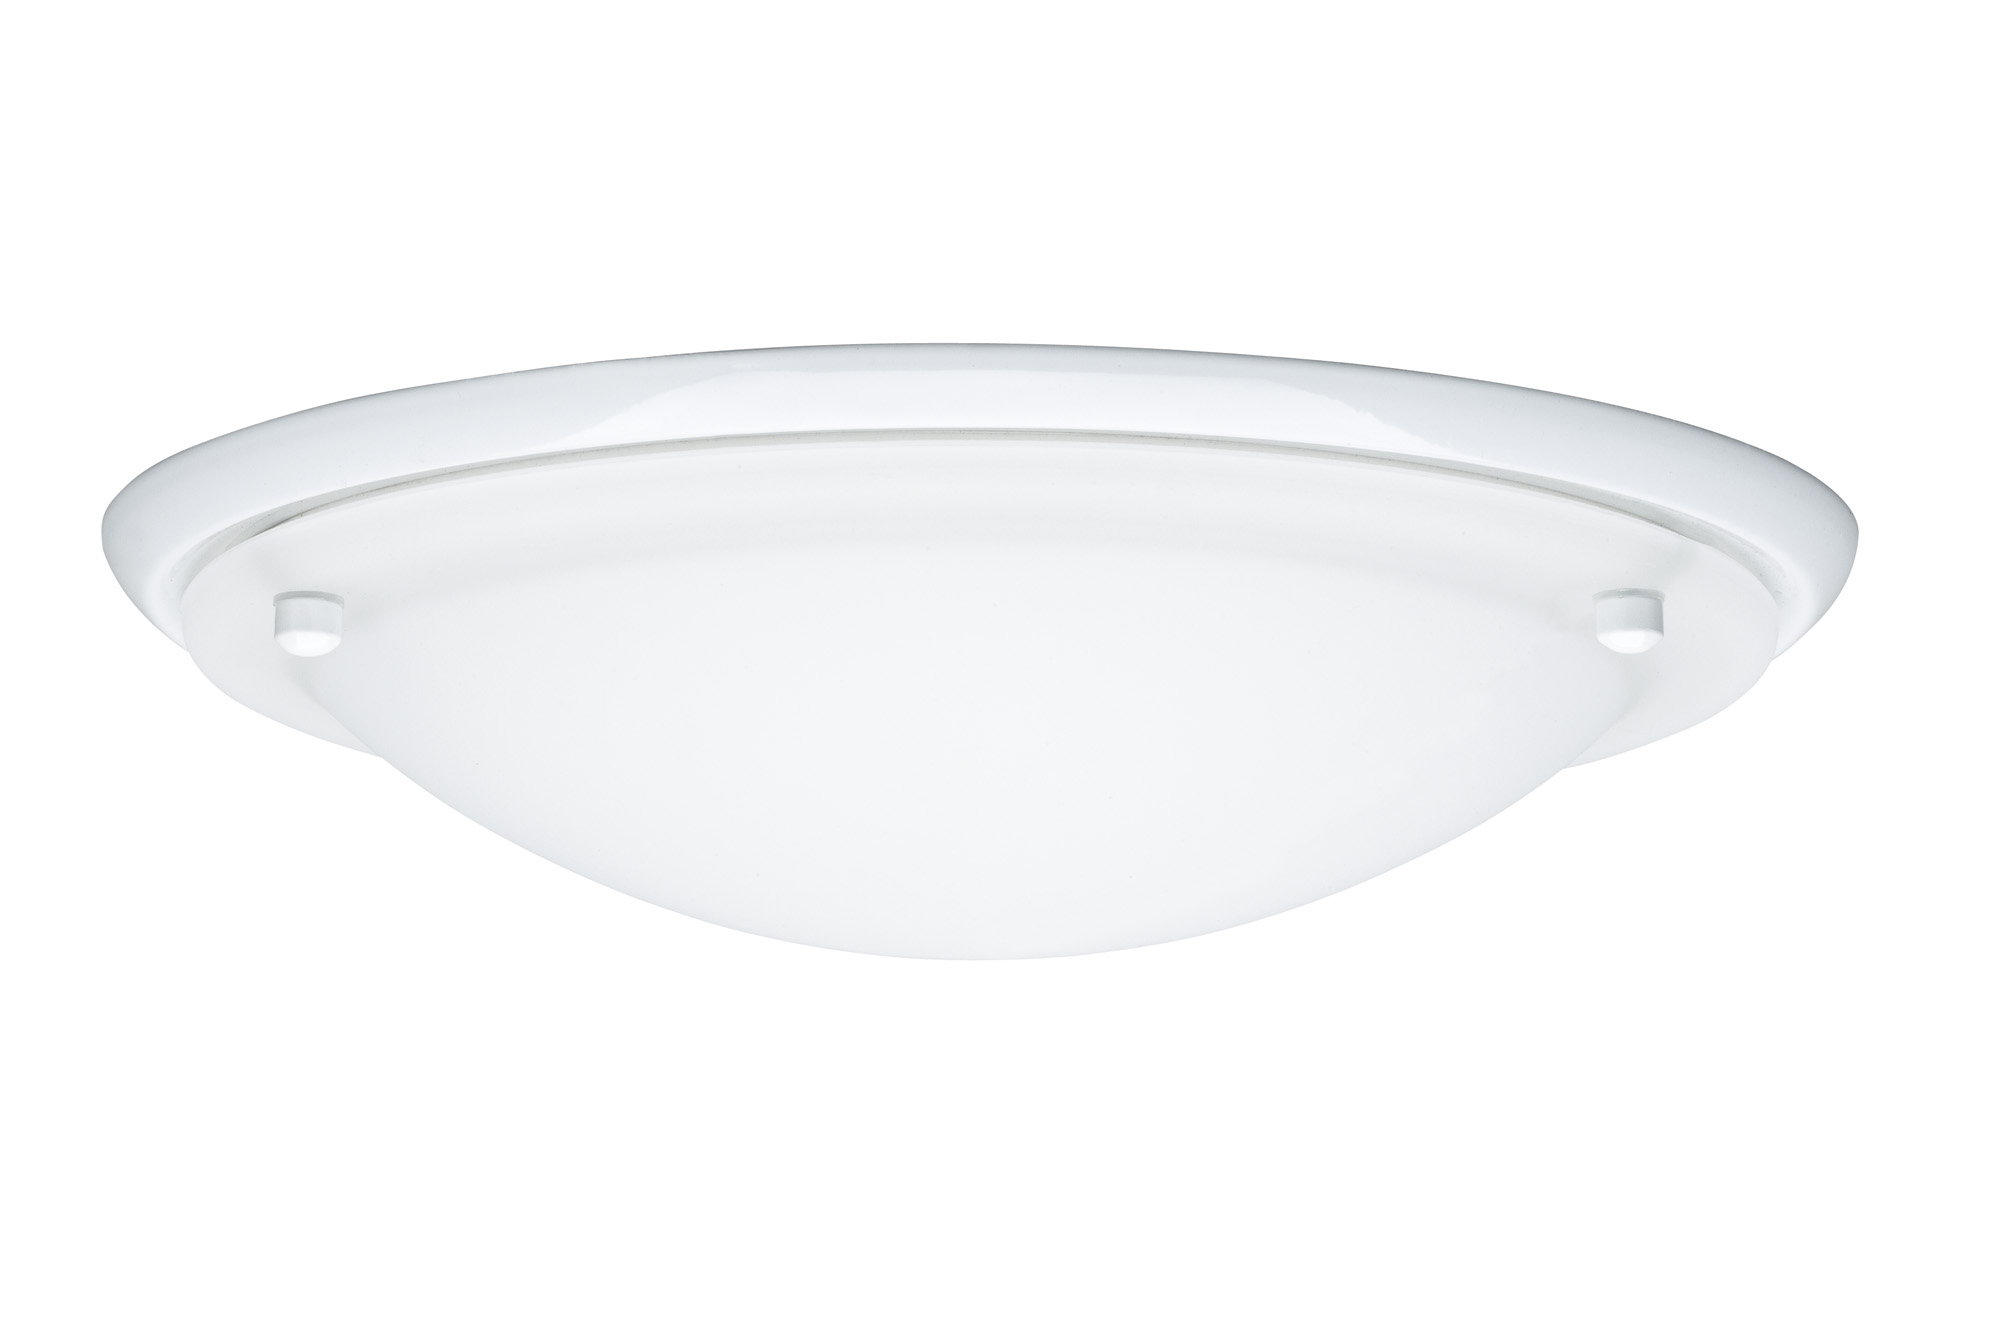 plafonnier salle de bain paulmann arctus ip44 max 60w 230v e27 blanc opaque. Black Bedroom Furniture Sets. Home Design Ideas